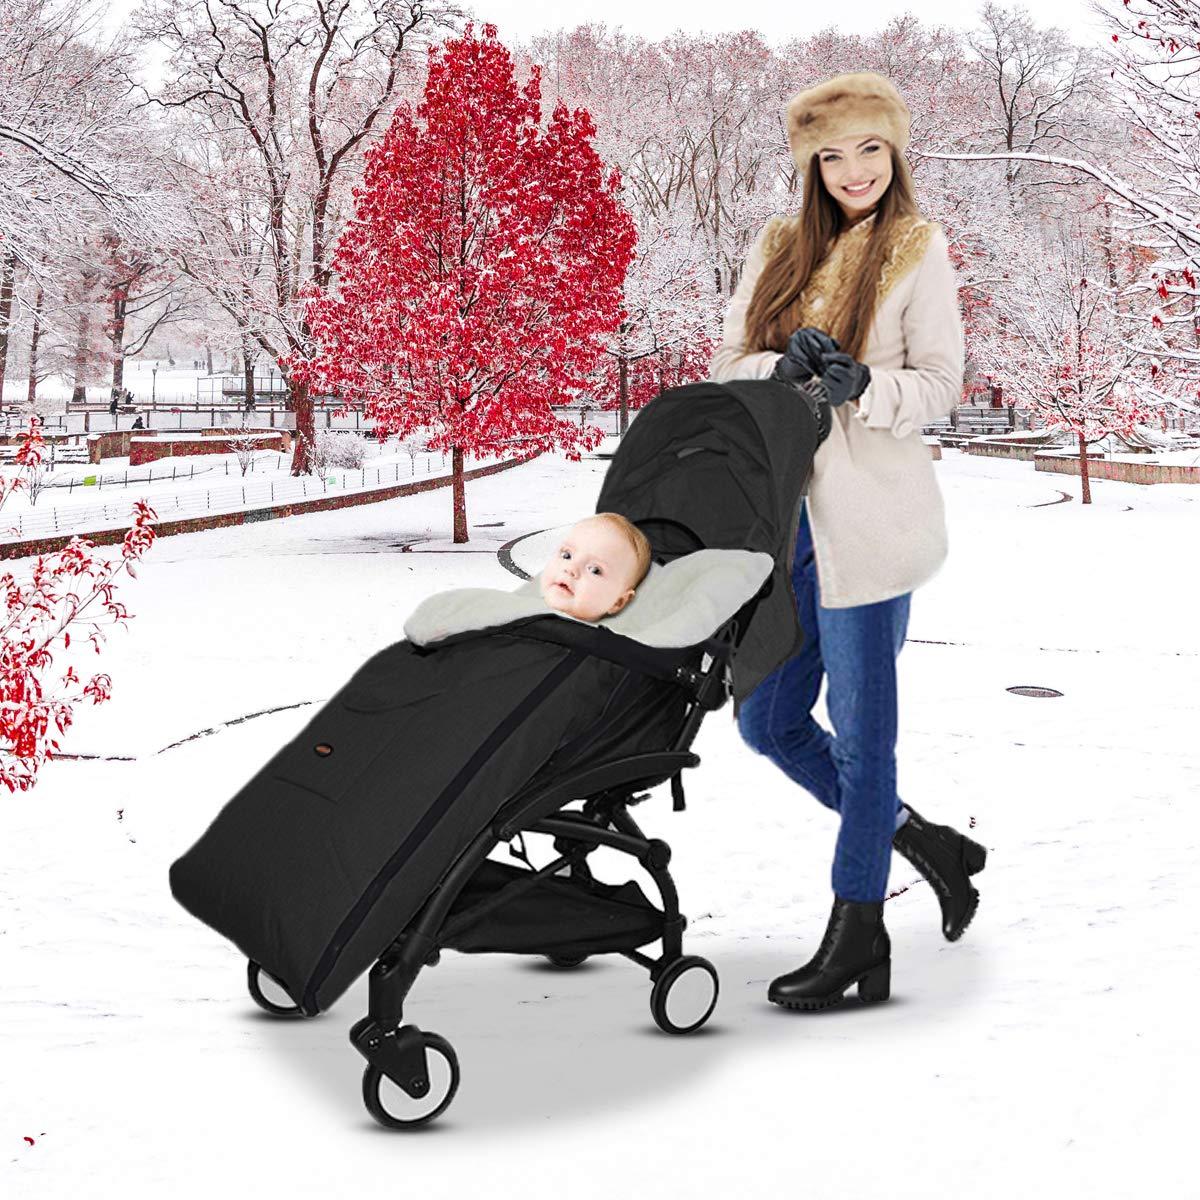 Negro AUVSTAR Saco de Dormir T/érmico Universal para Beb/é,Saco para silla de Paseo,Sacos de Abrigo para Carritos,Mantas Envolventes Invierno para Cochecito,Multifuncional Beb/é Cubrepiernas Impermeable